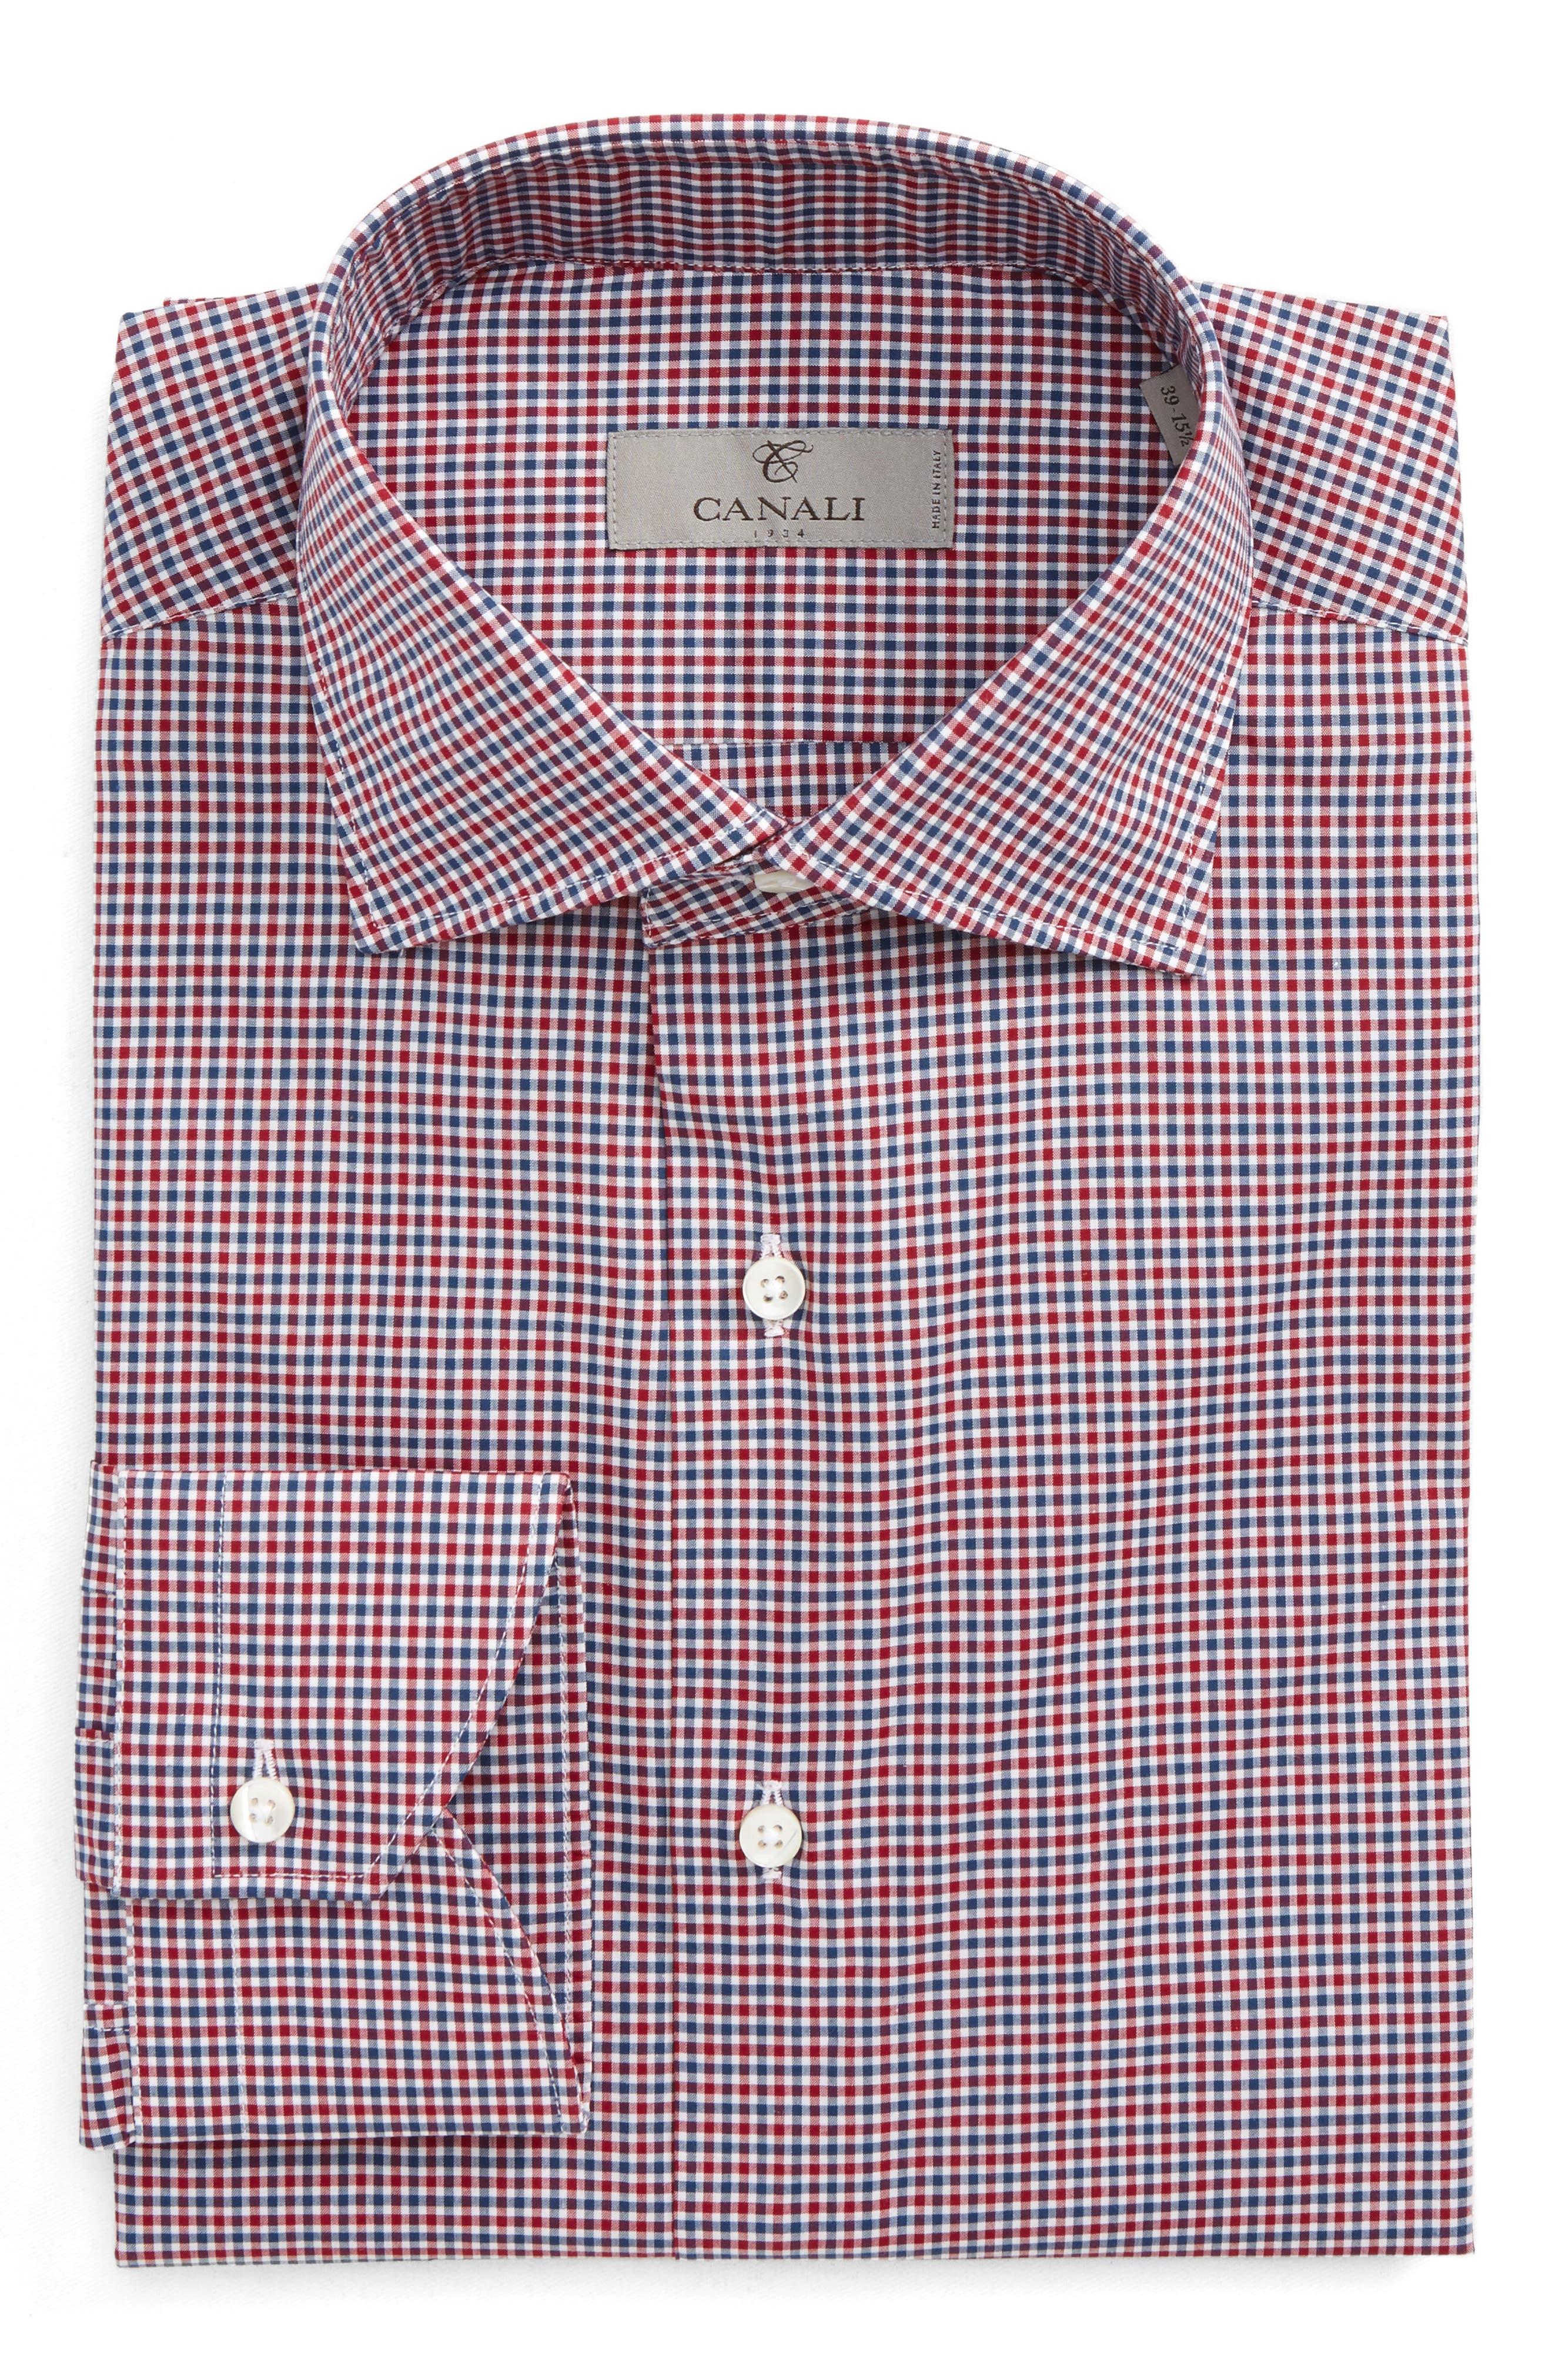 Regular Fit Dress Shirt,                         Main,                         color, 620